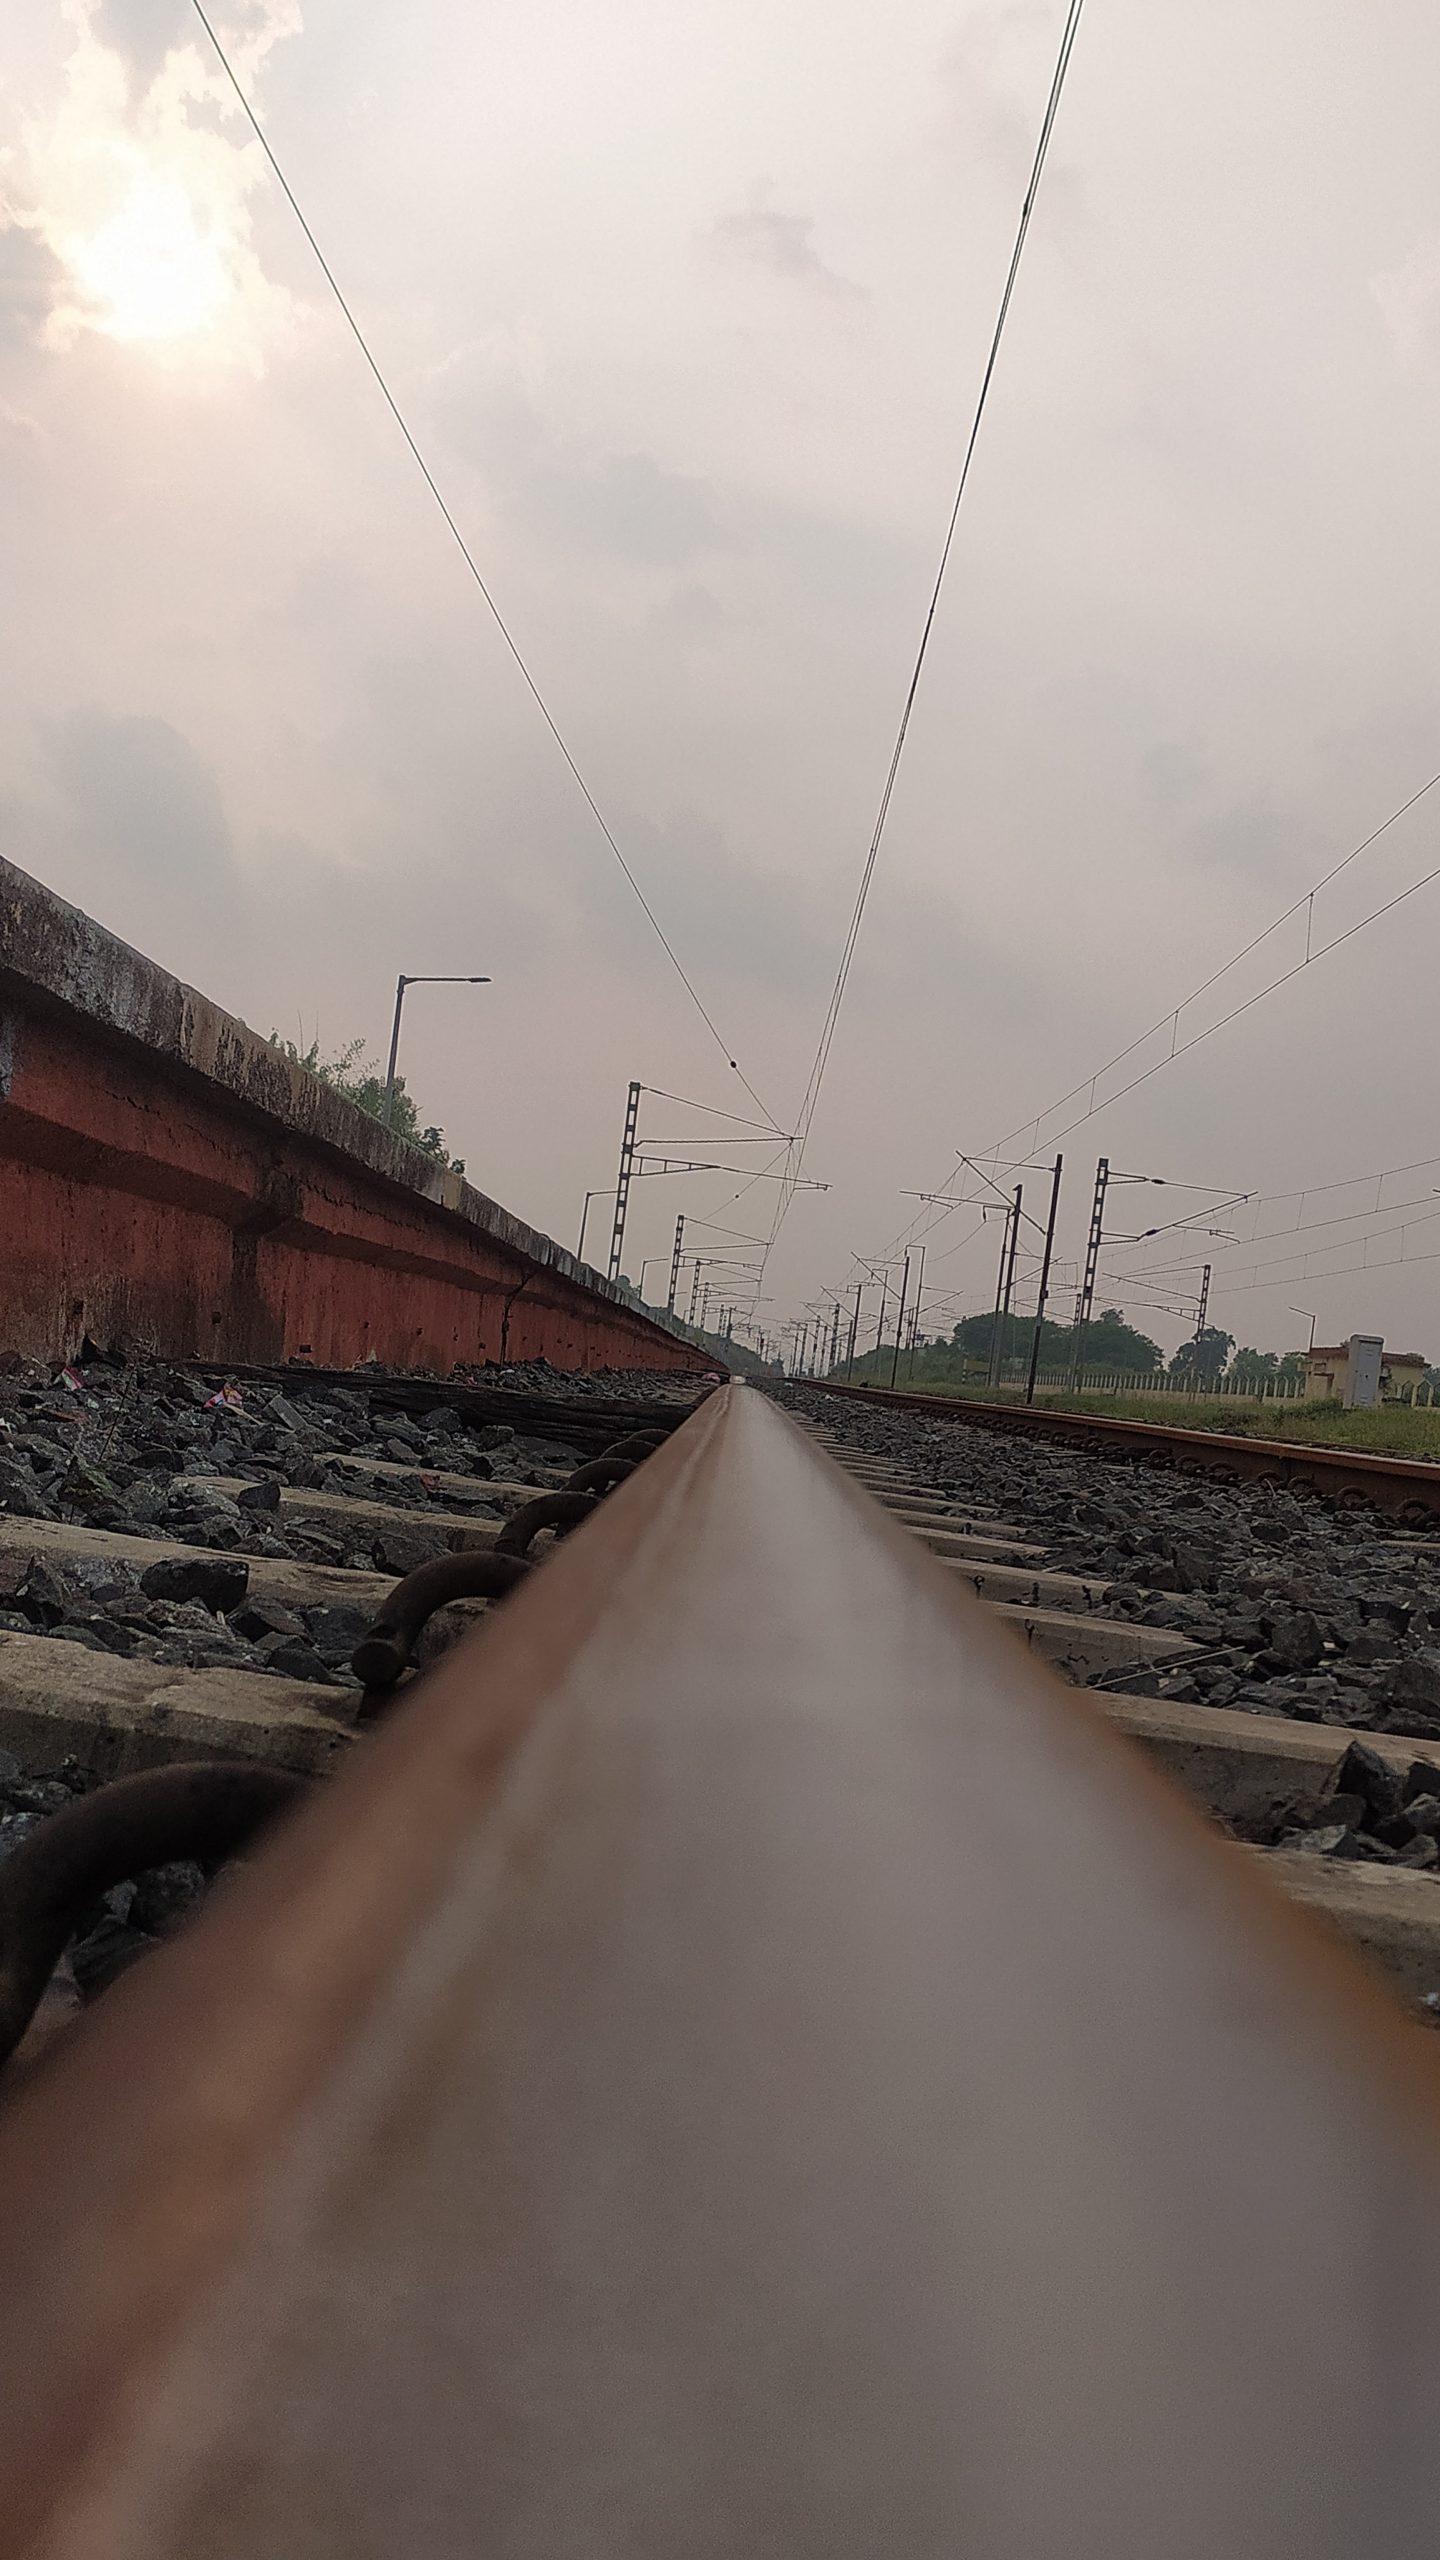 A railway track